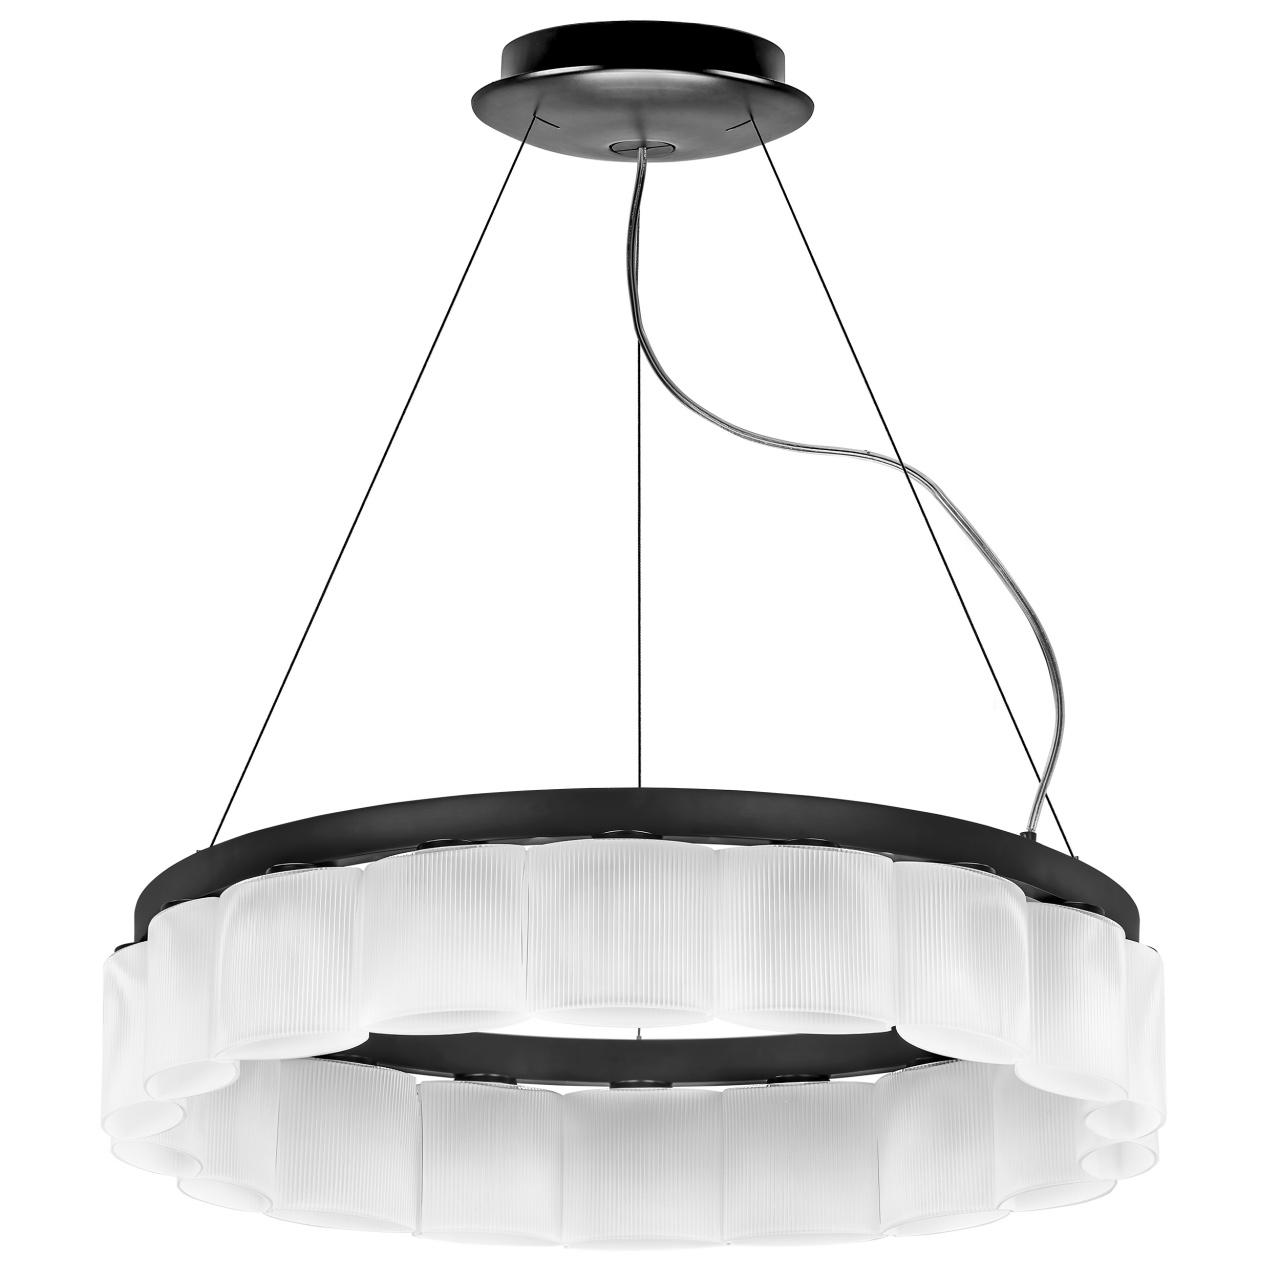 Люстра подвесная Nibbler 18х6W (Led) G9 черный / белый Lightstar 812186